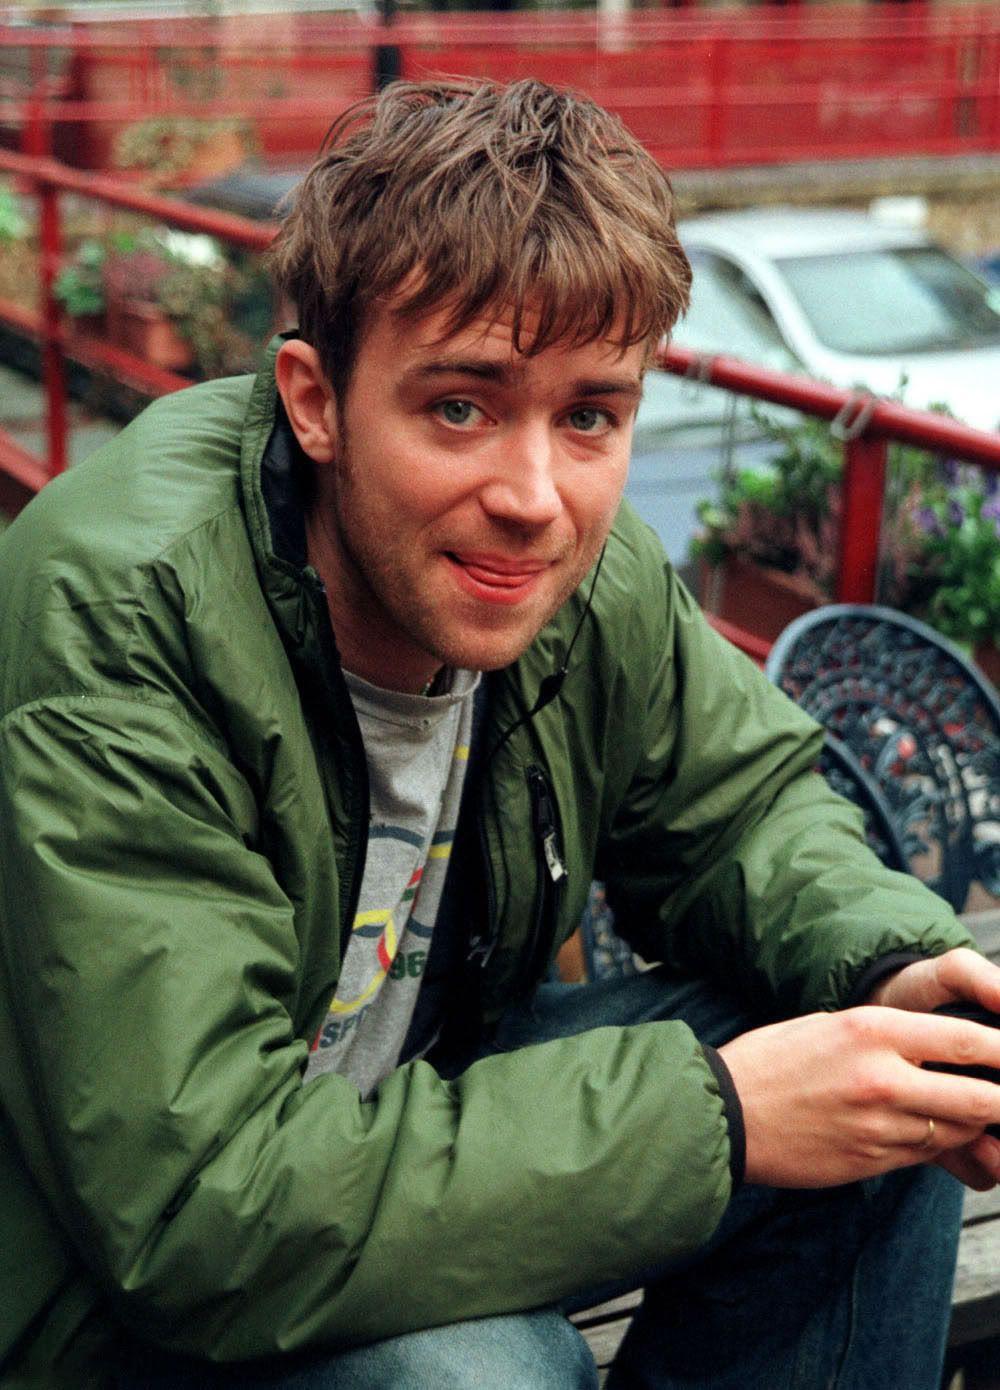 Damon albarn with his signature hair cut bloke for Damon albarn